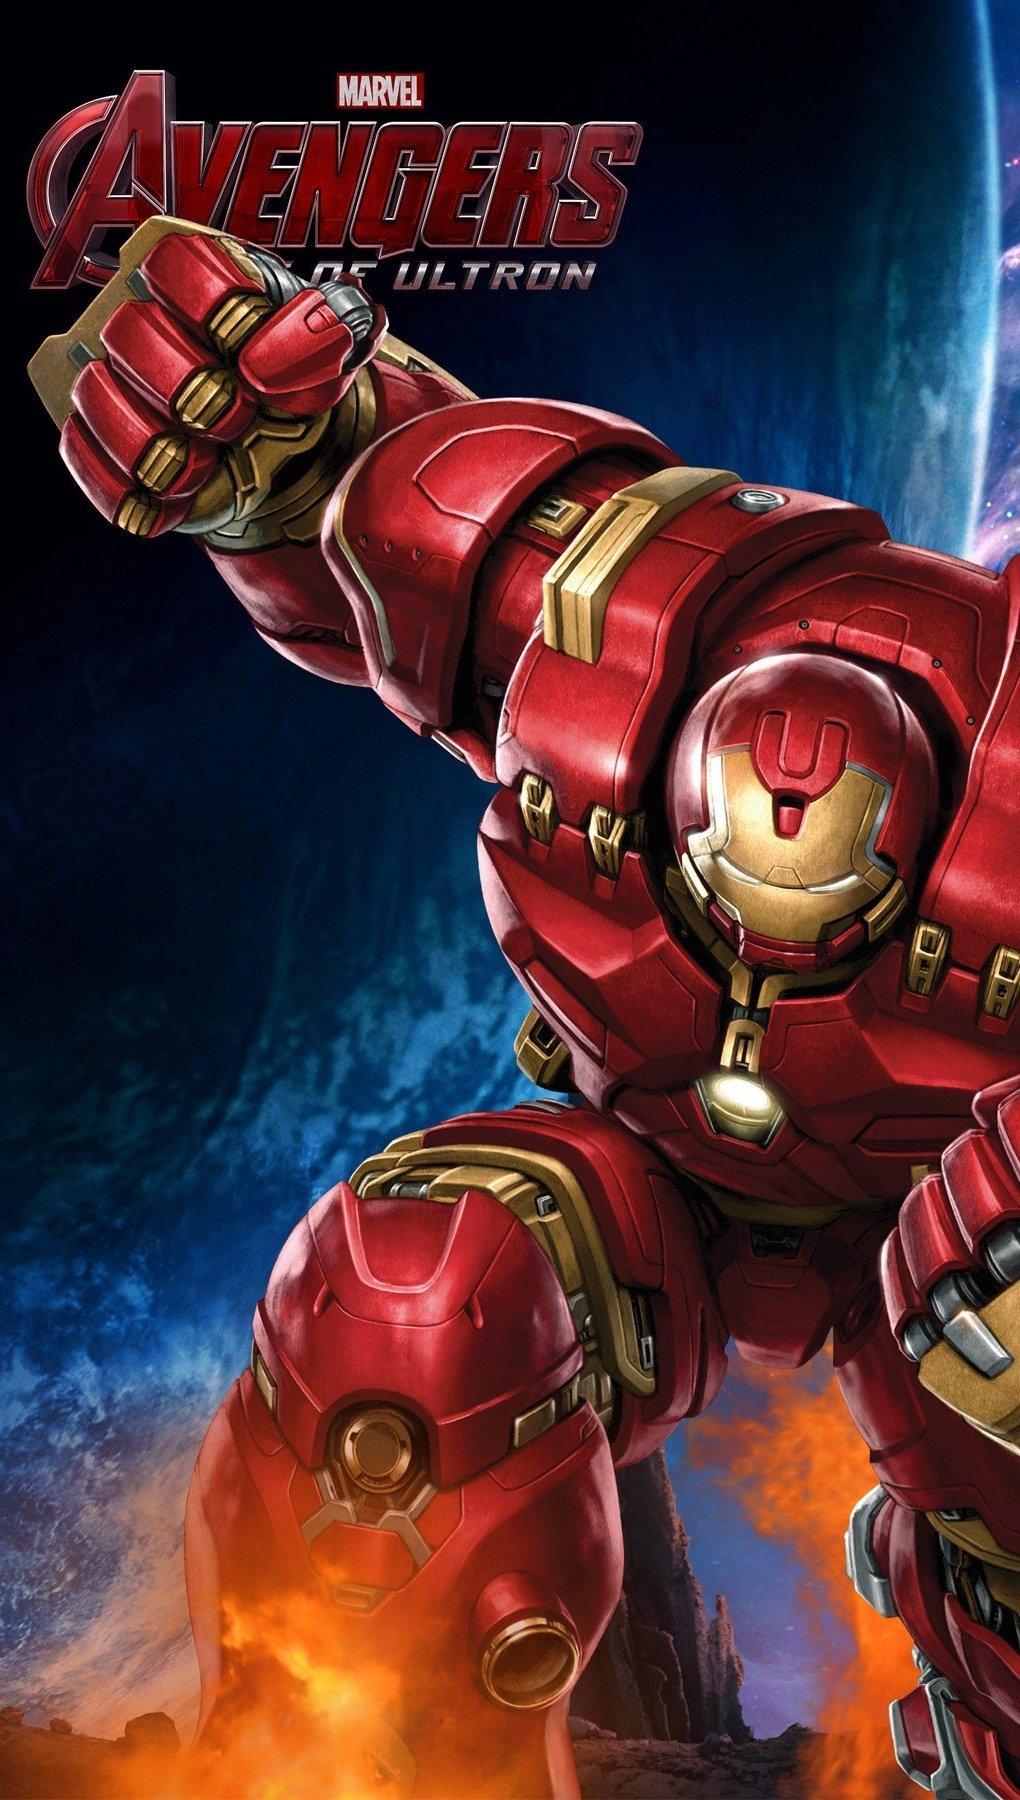 Wallpaper Iron Man Hulkbuster from The Avengers Vertical